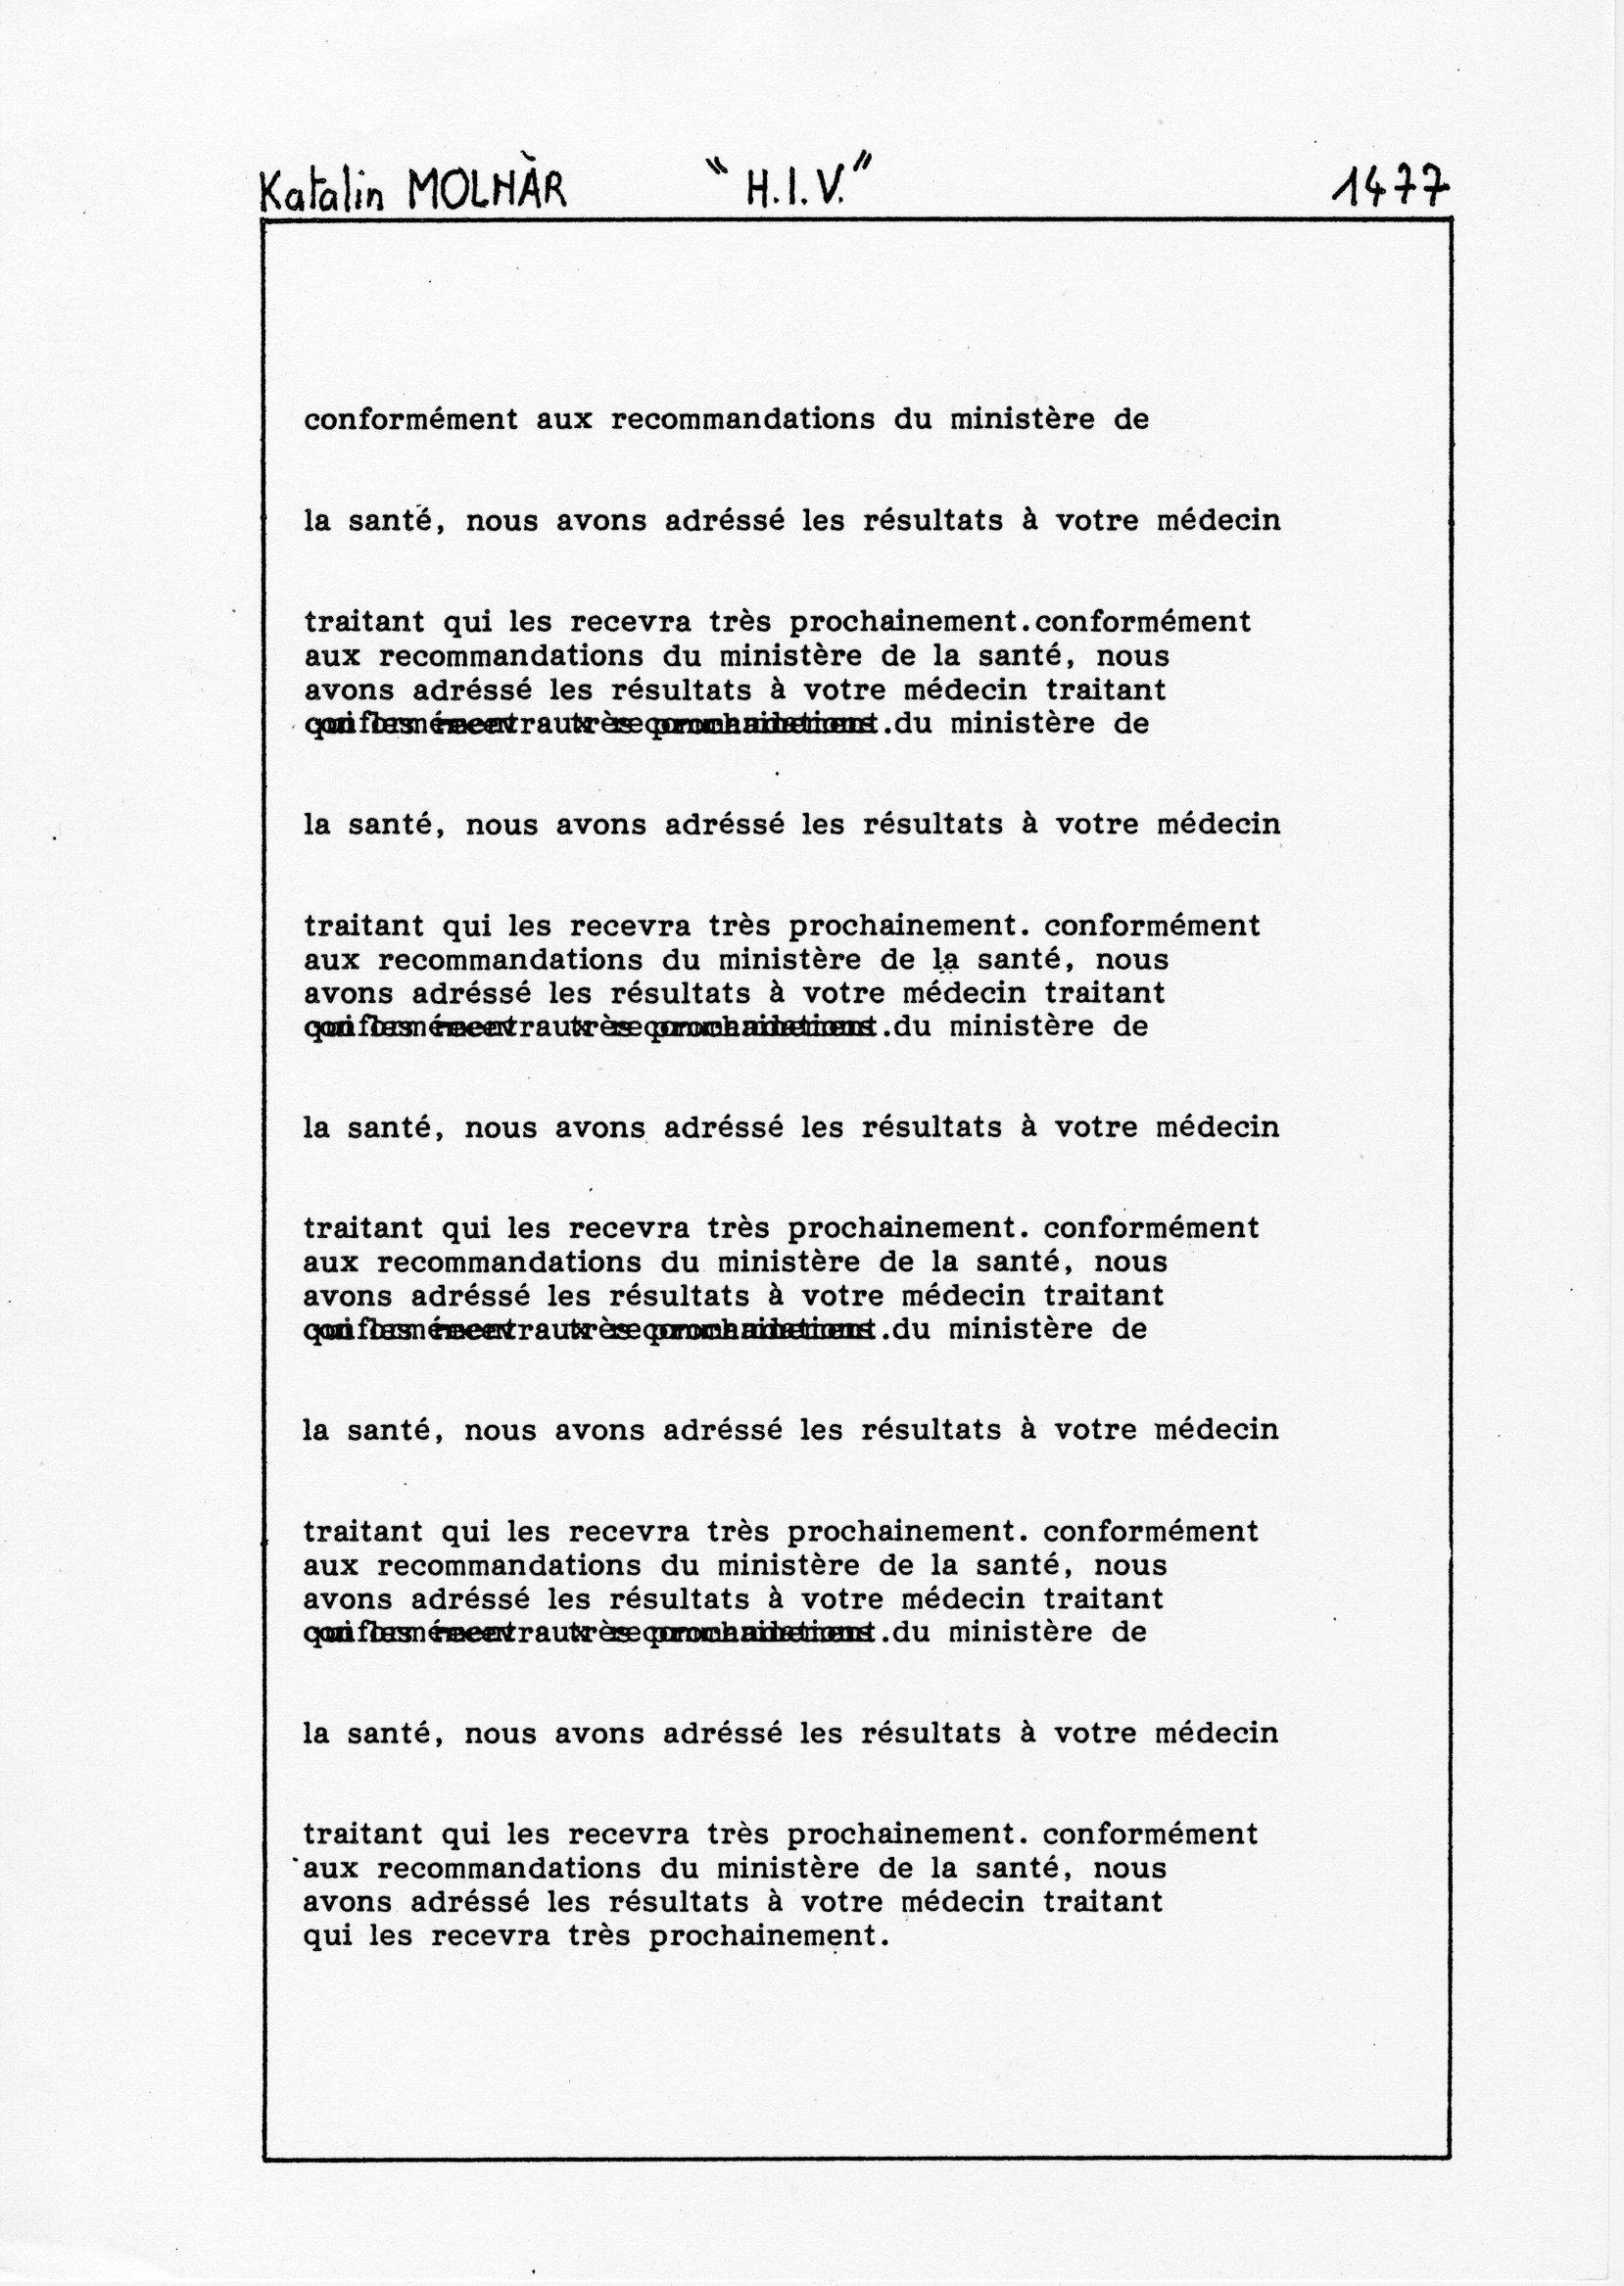 page 1477 K. Molnar H.I.V.